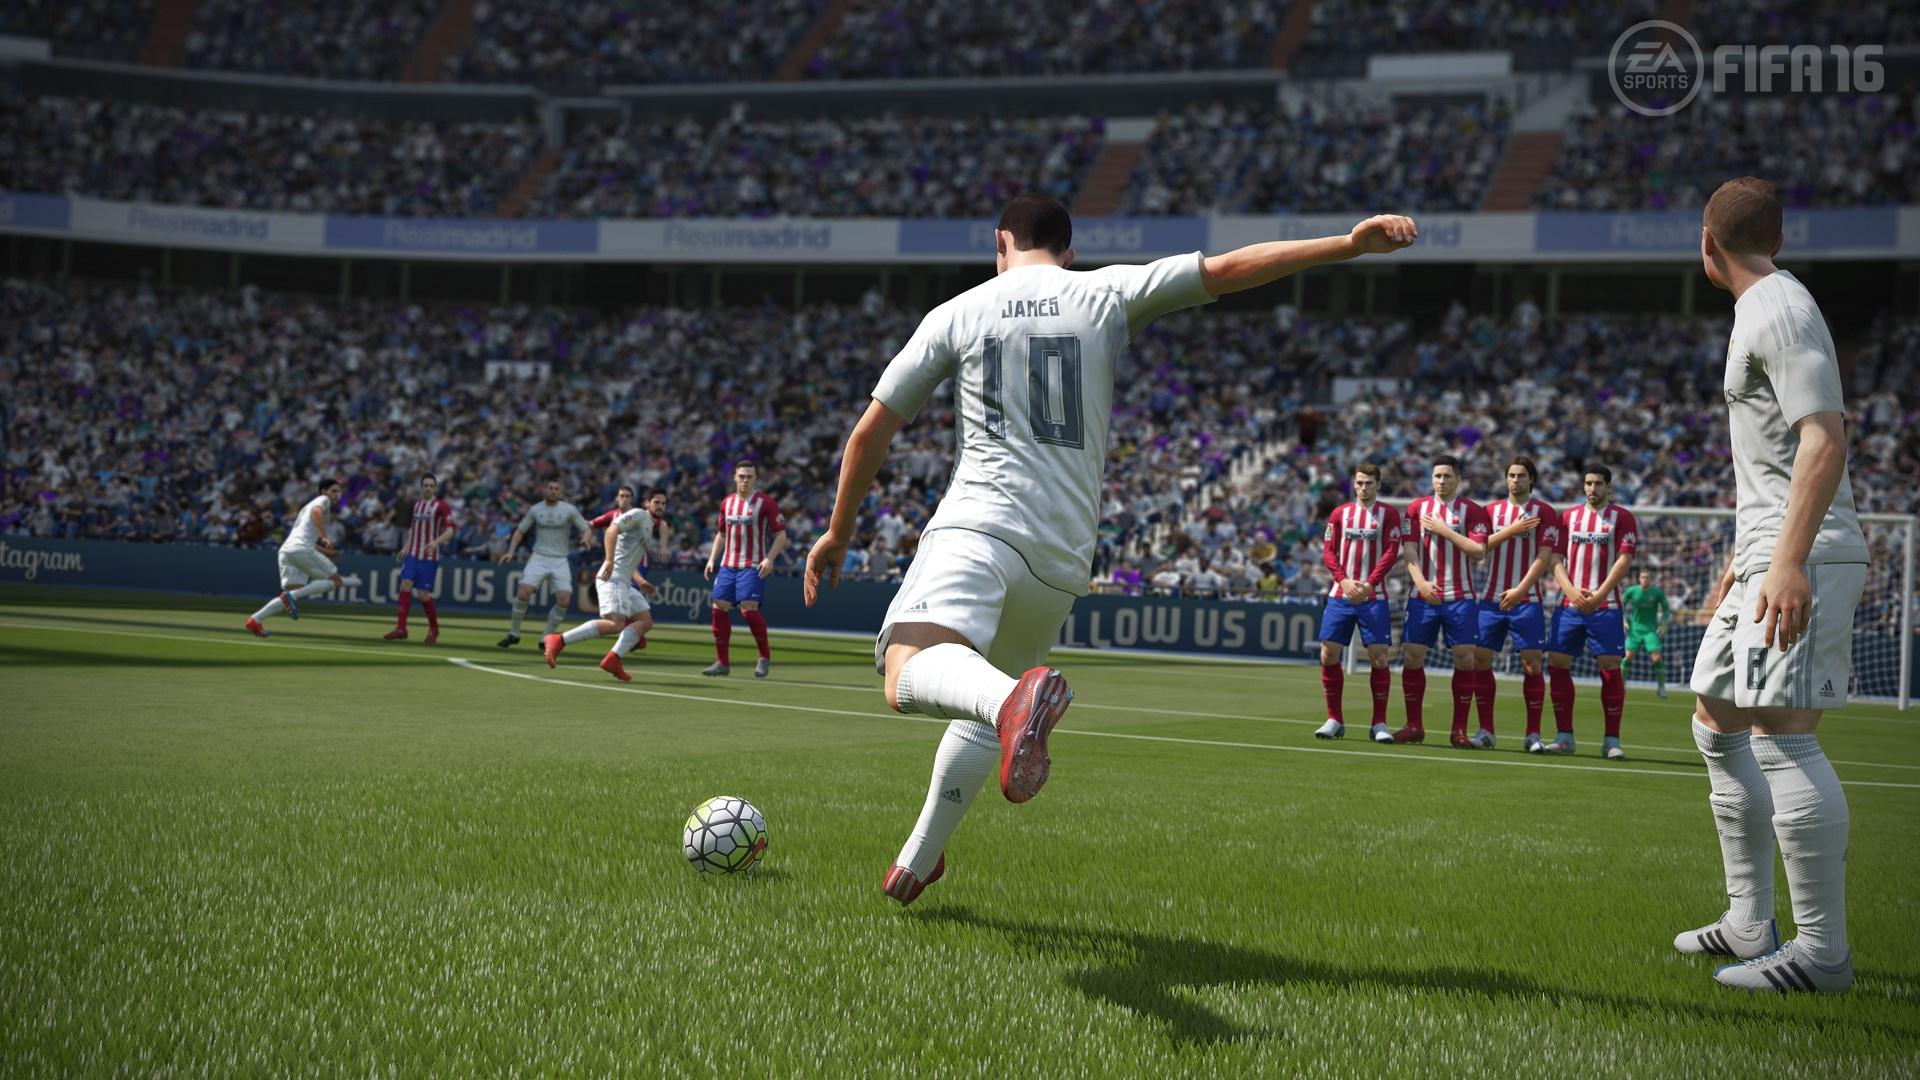 To FIFA 17 θα χρησιμοποιεί την Frostbite engine 2916861-fifa16_xboxone_ps4_gamescom_rmvatl_lr_wm